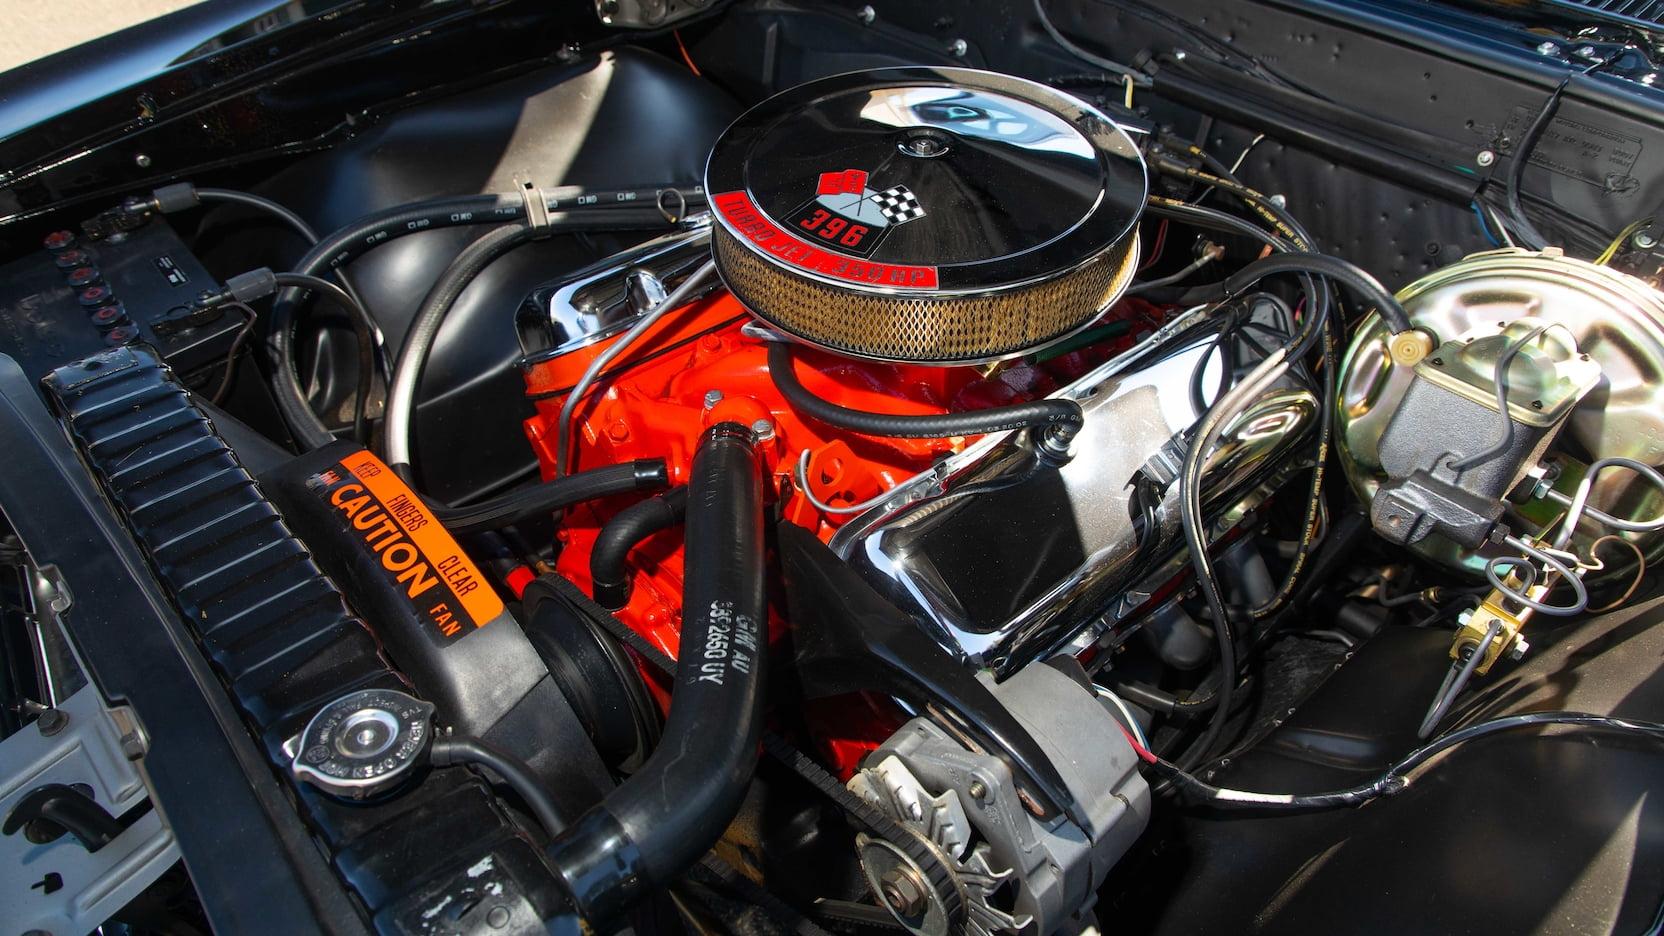 1967 Chevrolet Chevelle SS Engine